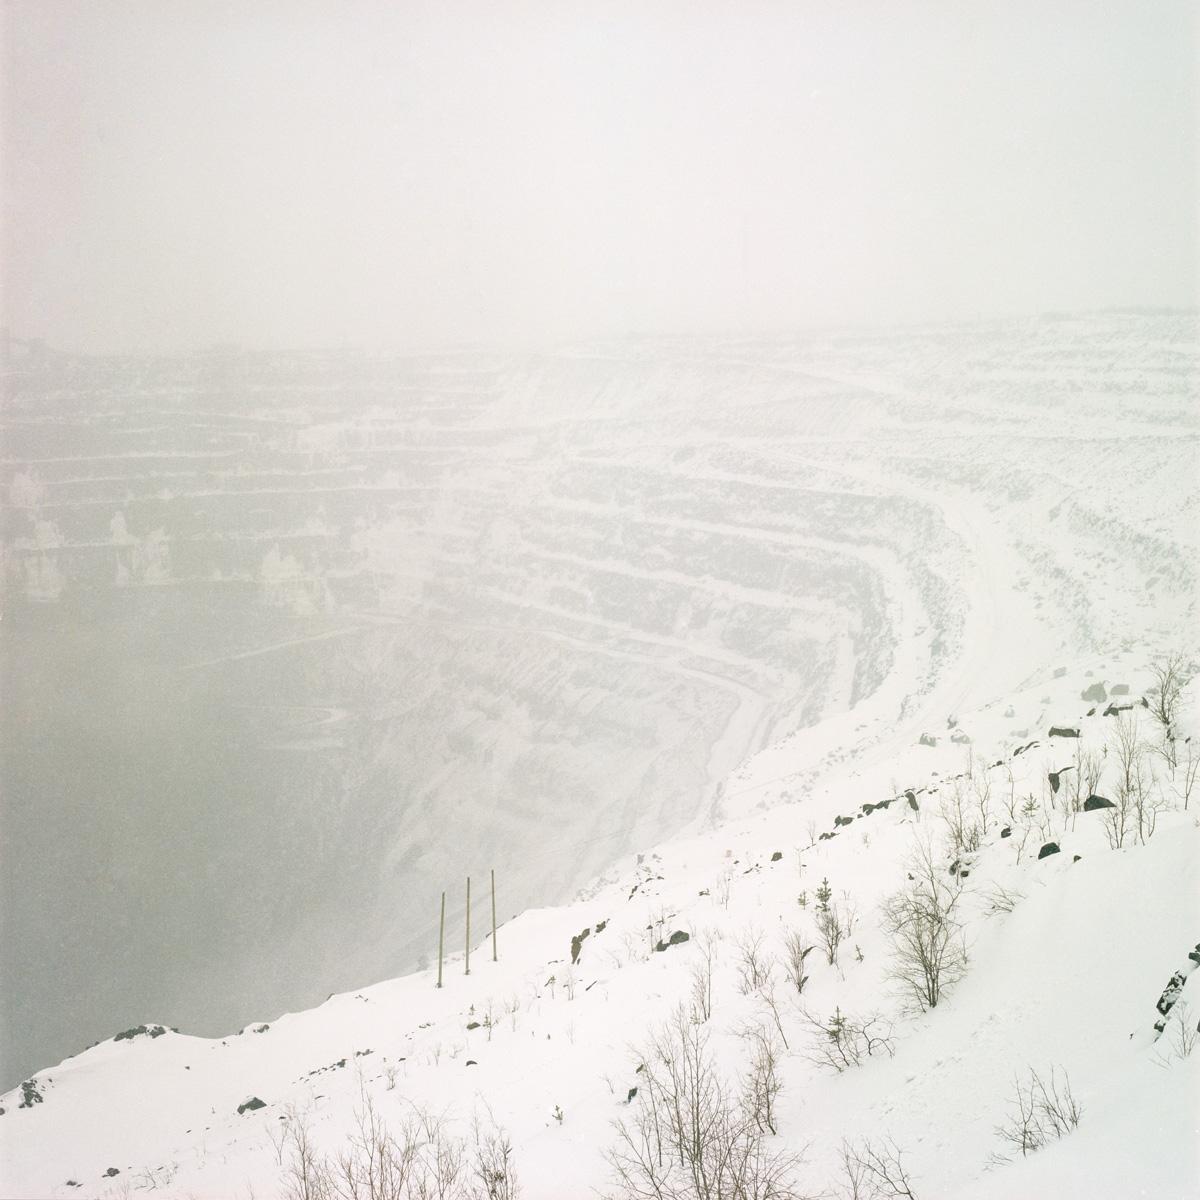 Mikhail Lebedev Snow Desert C41magazine Photography 5